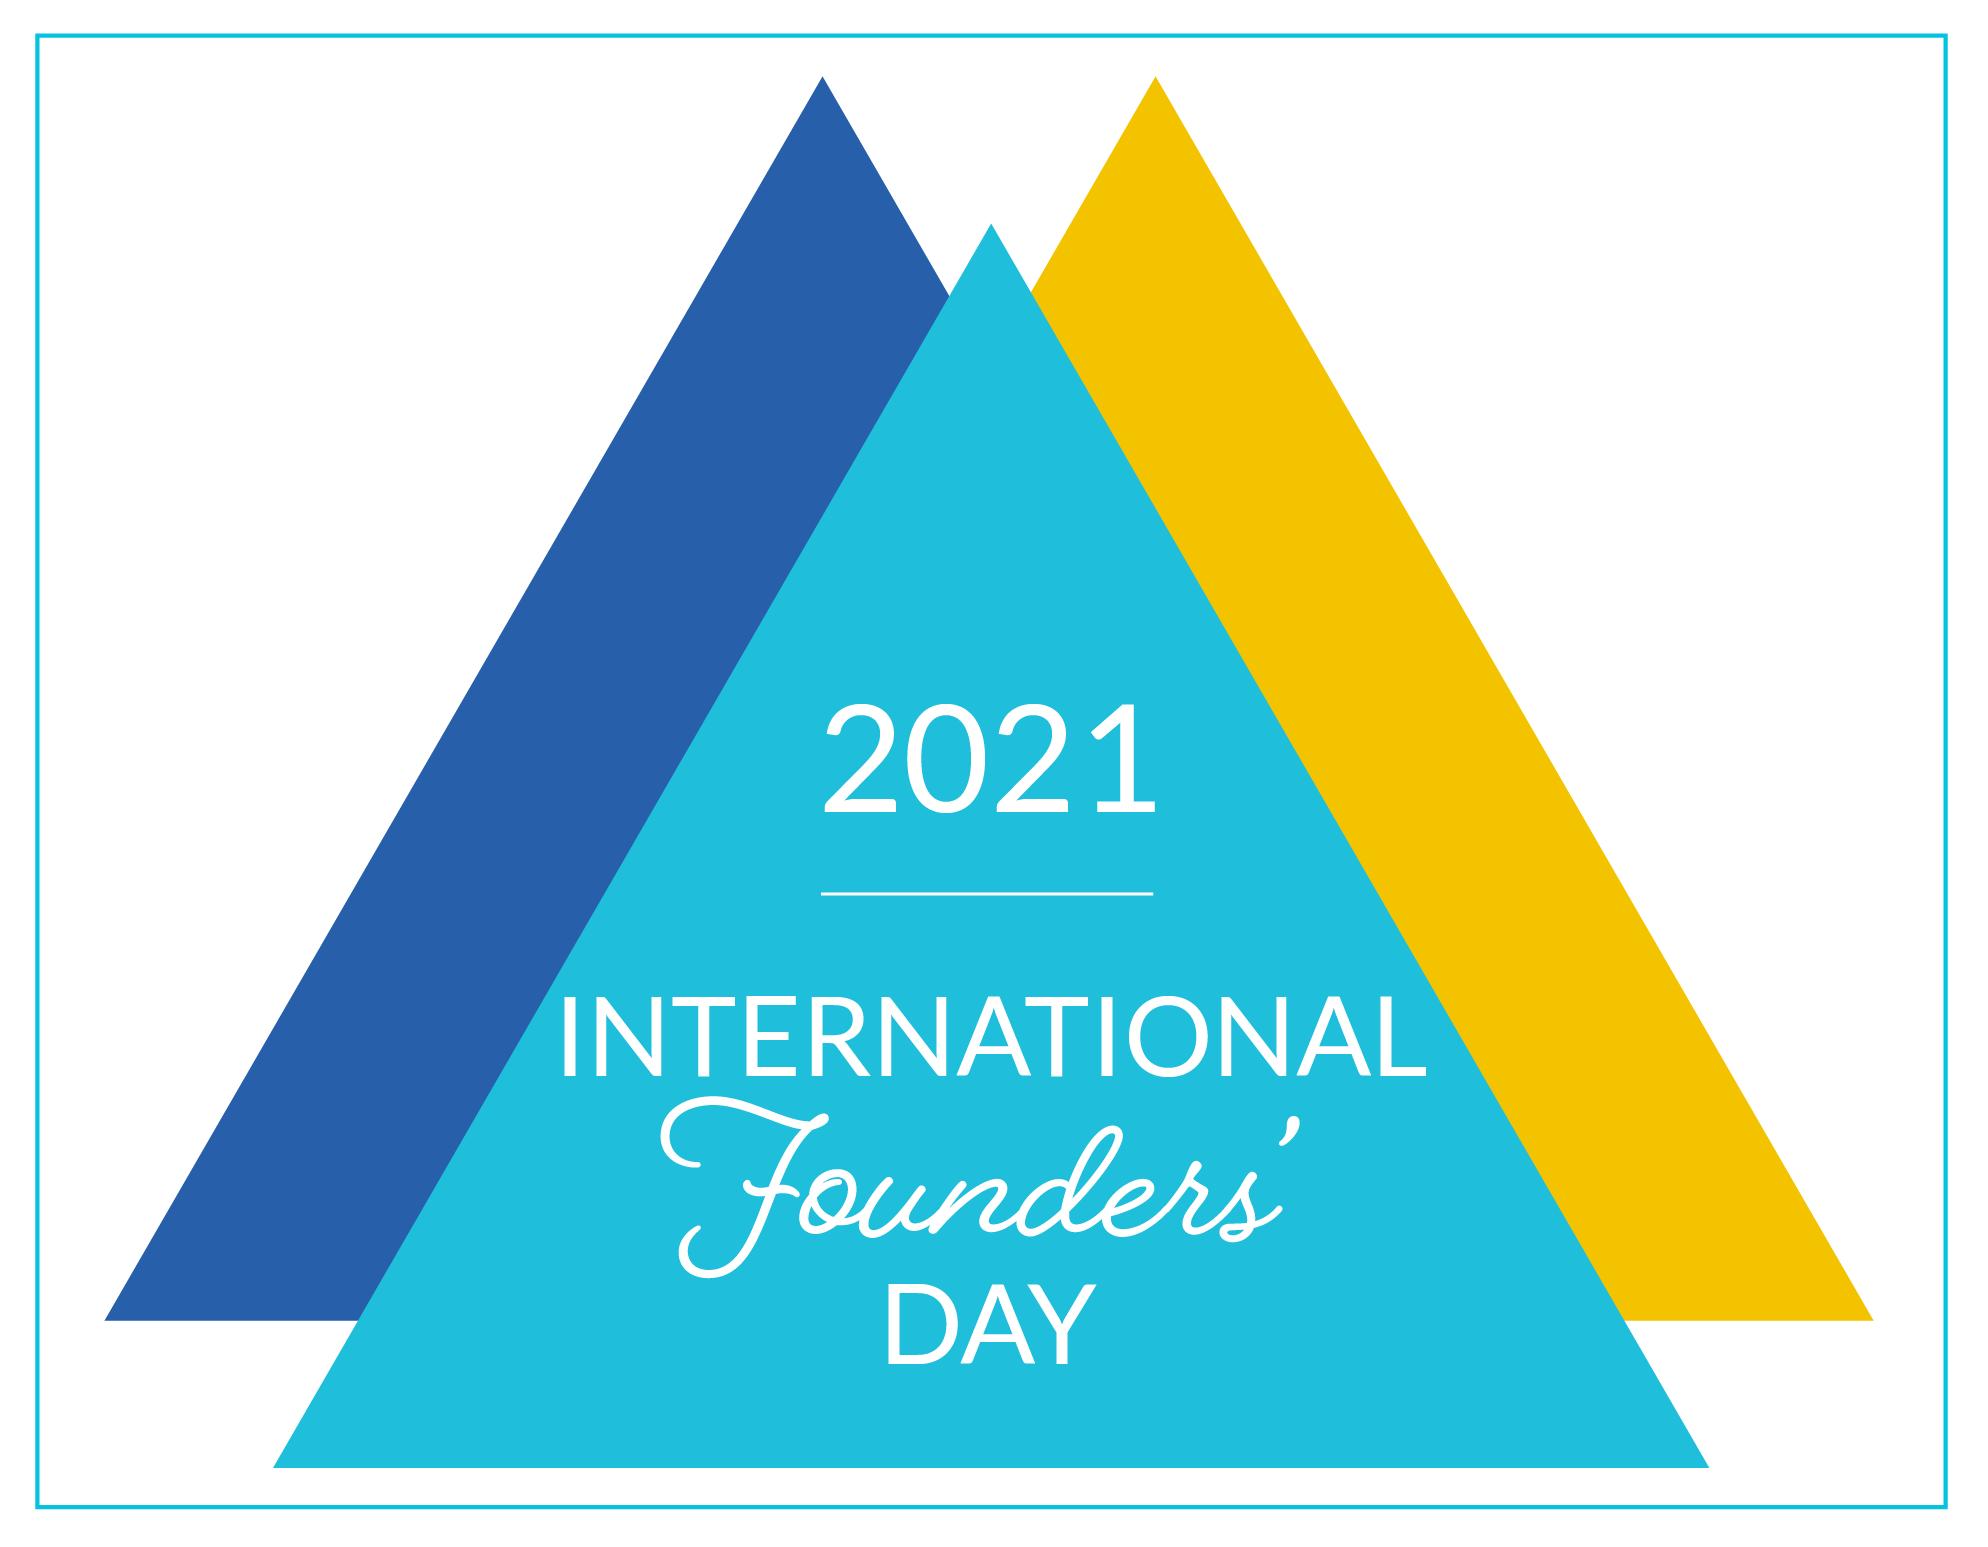 International Founders' Day Celebration 2021